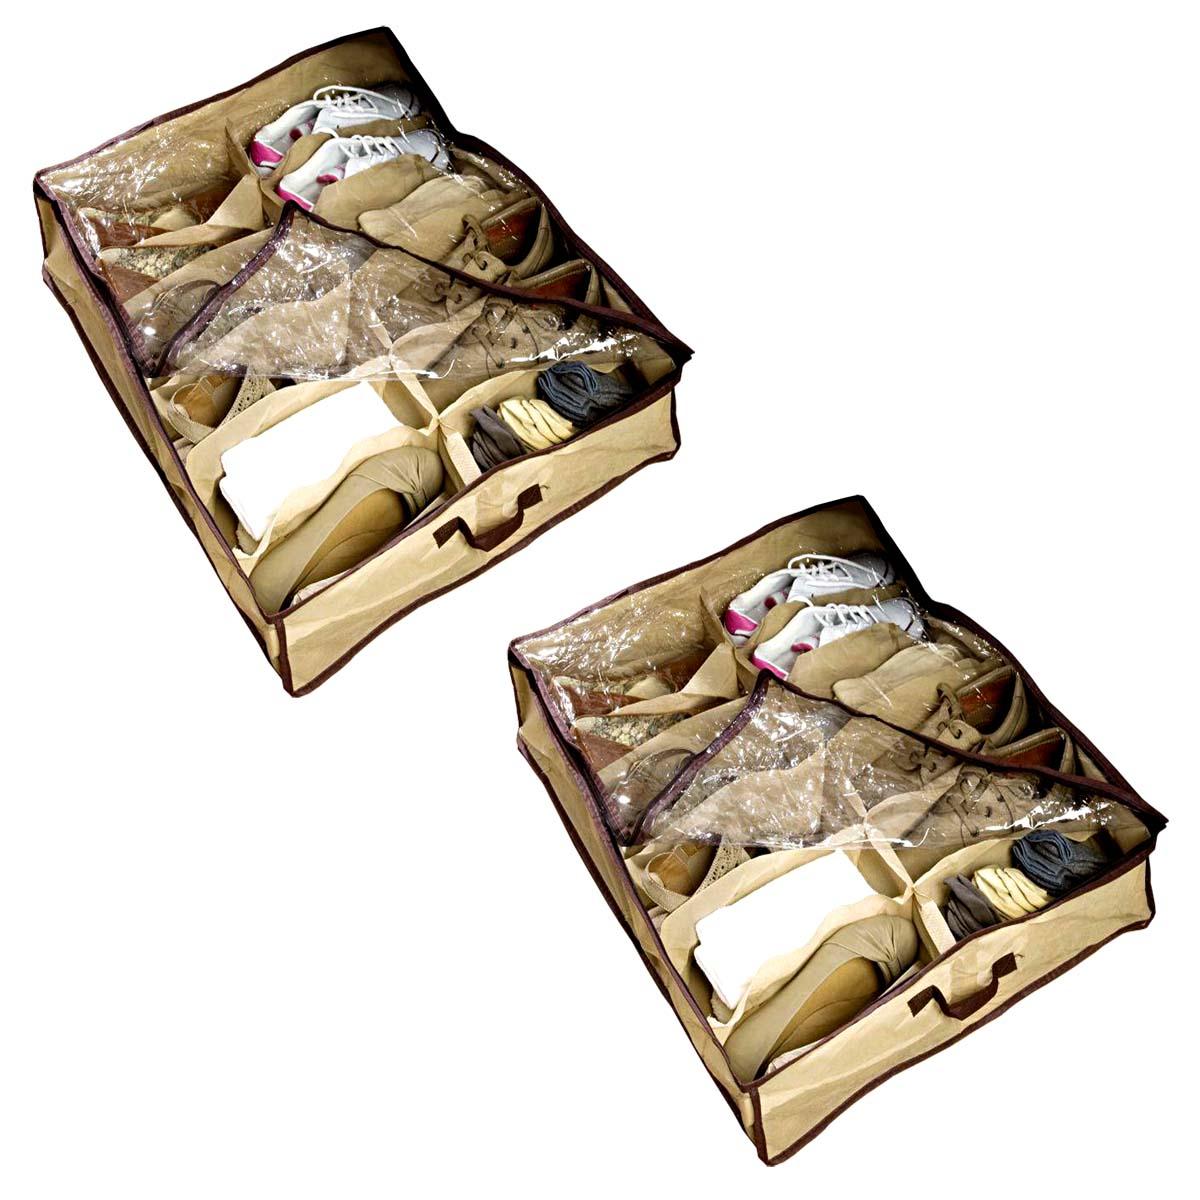 2x unterbettbox schuhe 12 f cher schuhaufbewahrung bett unterbettkommode ebay. Black Bedroom Furniture Sets. Home Design Ideas